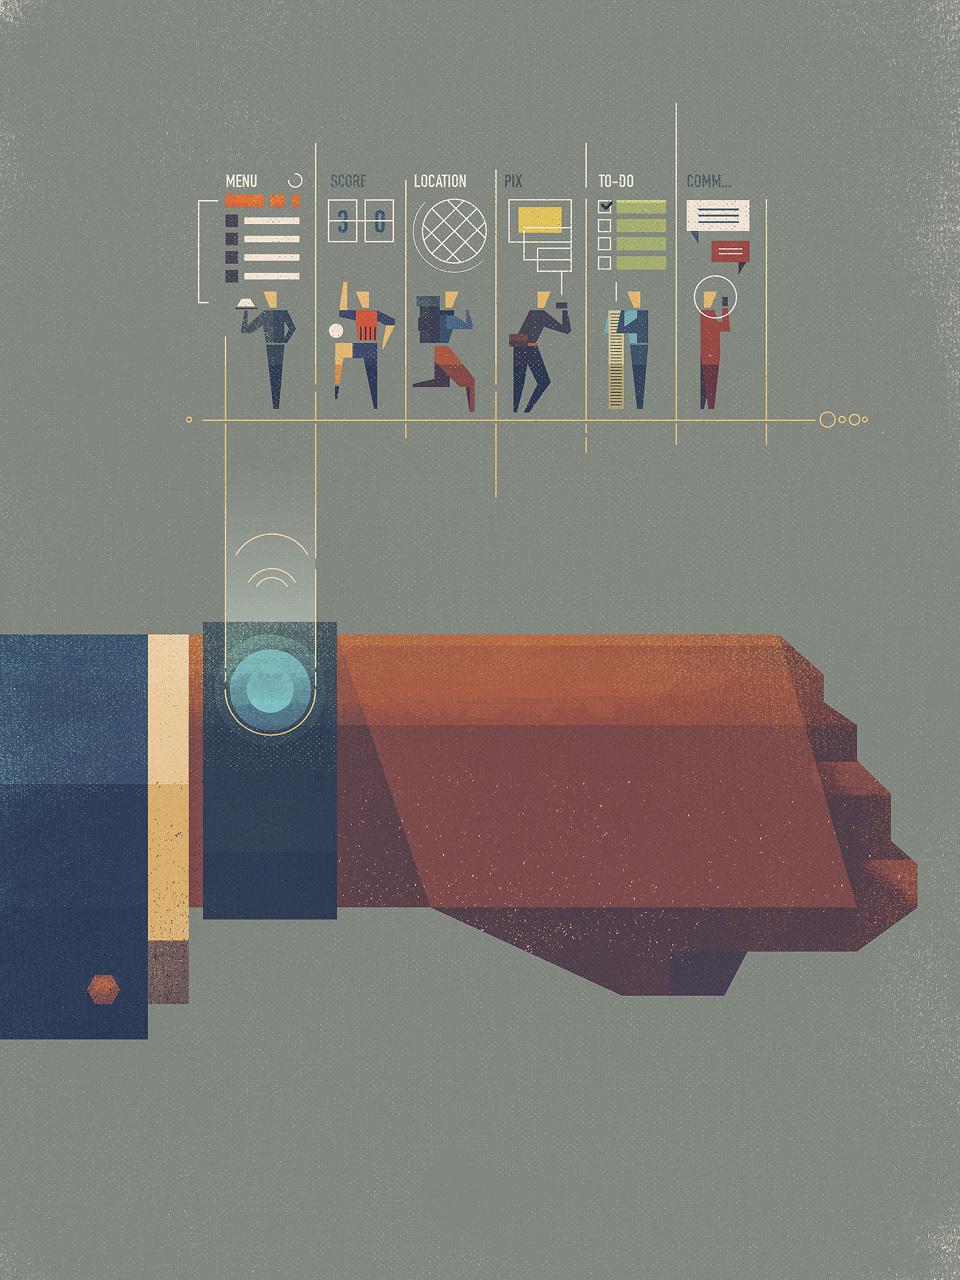 Wearables illustration by Dan Matutina | Inspiration DE